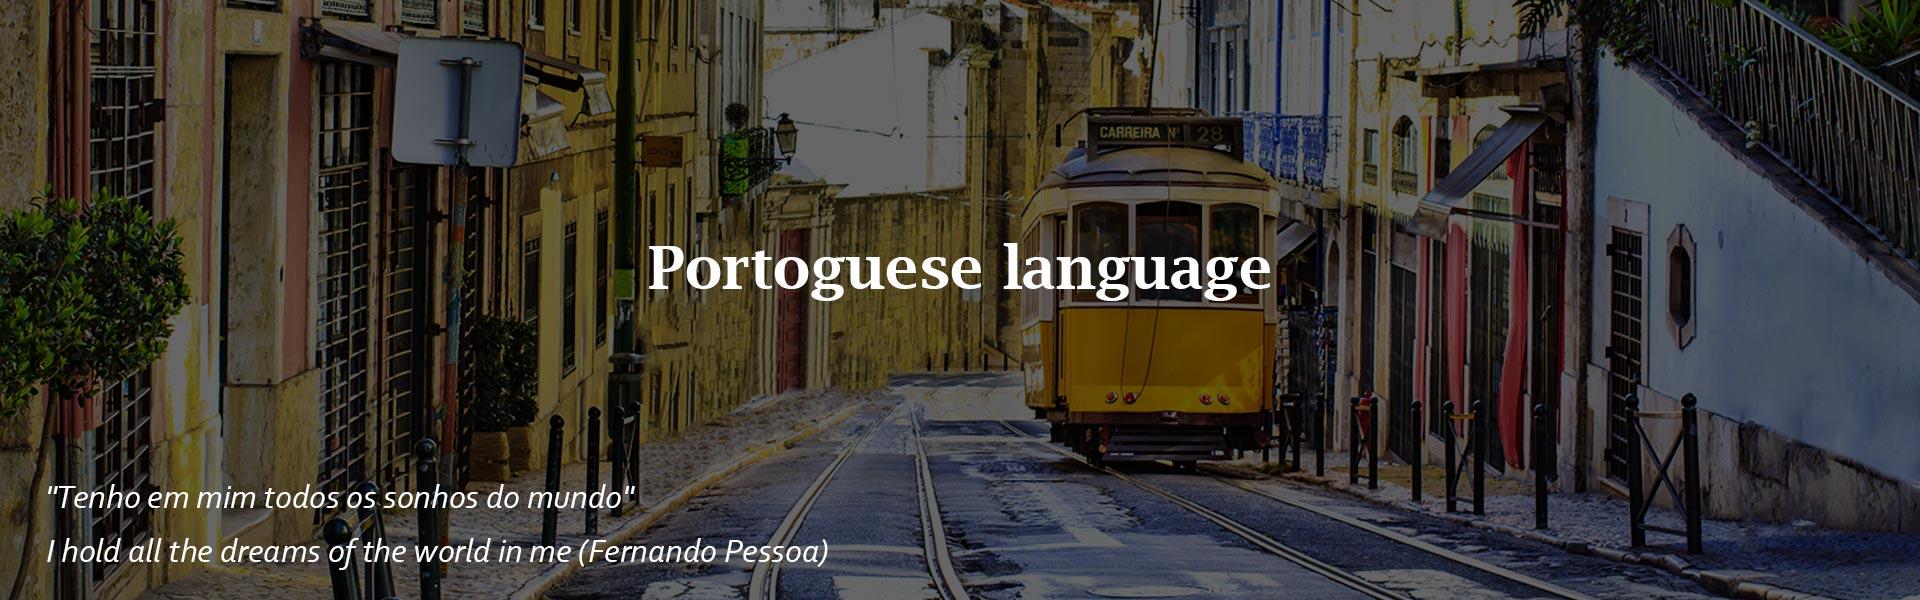 Portoguese-language-Alif